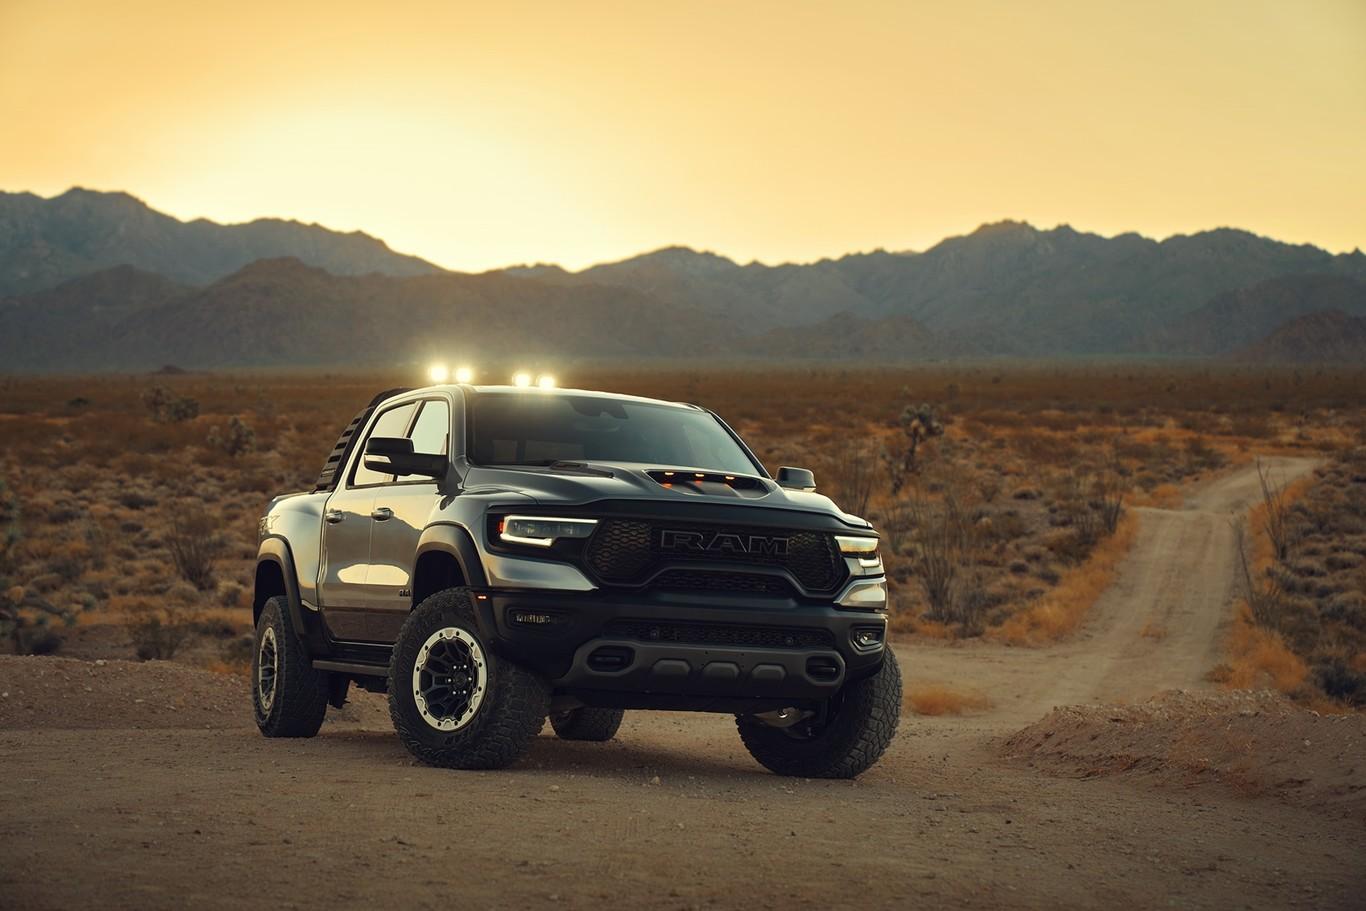 2021 Dodge Ram 1500 Exterior